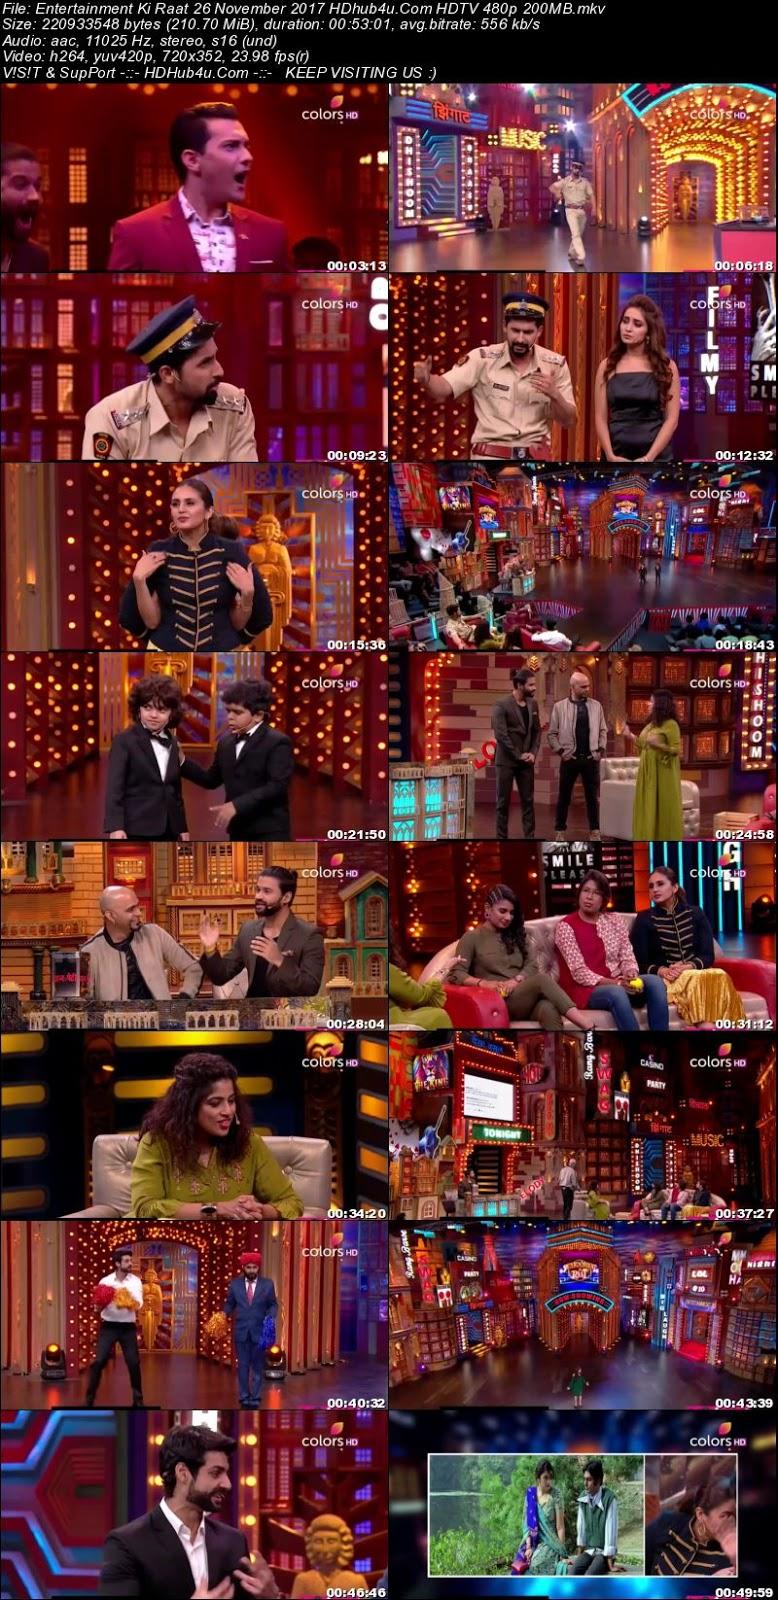 Entertainment Ki Raat 26th November 2017 480p HDTV 200MB Download